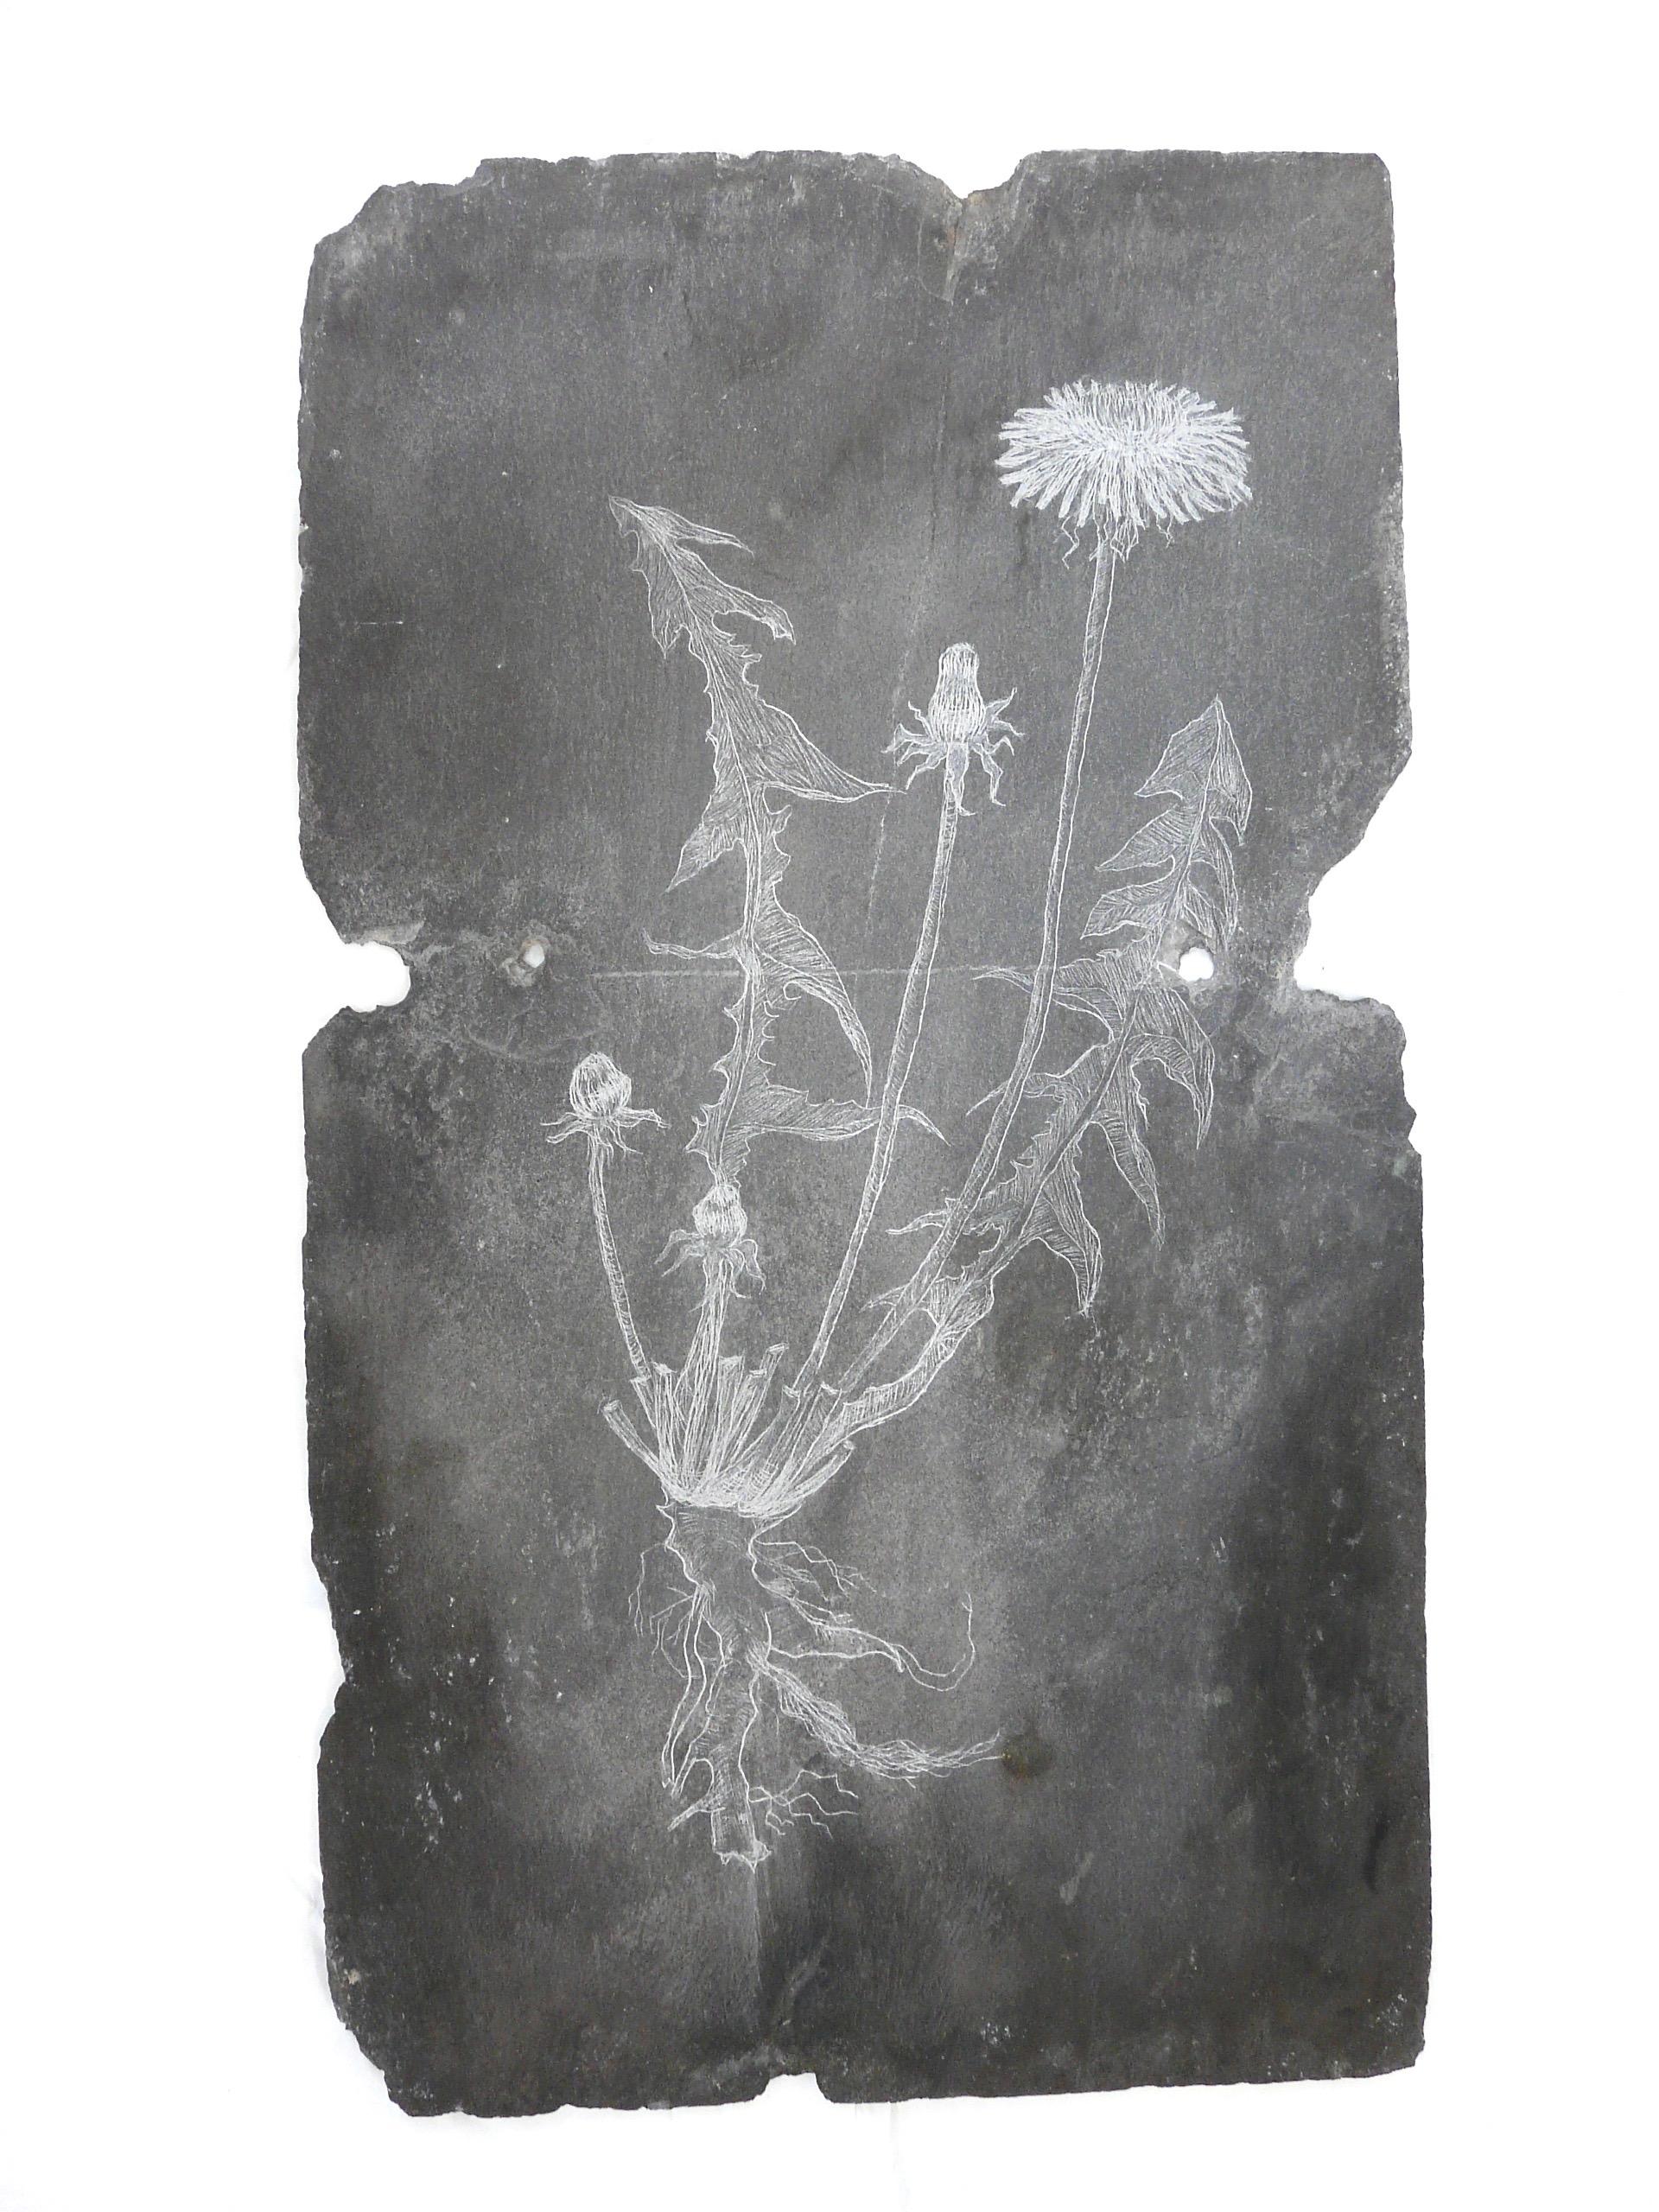 Dandelion, Slate Engraving.